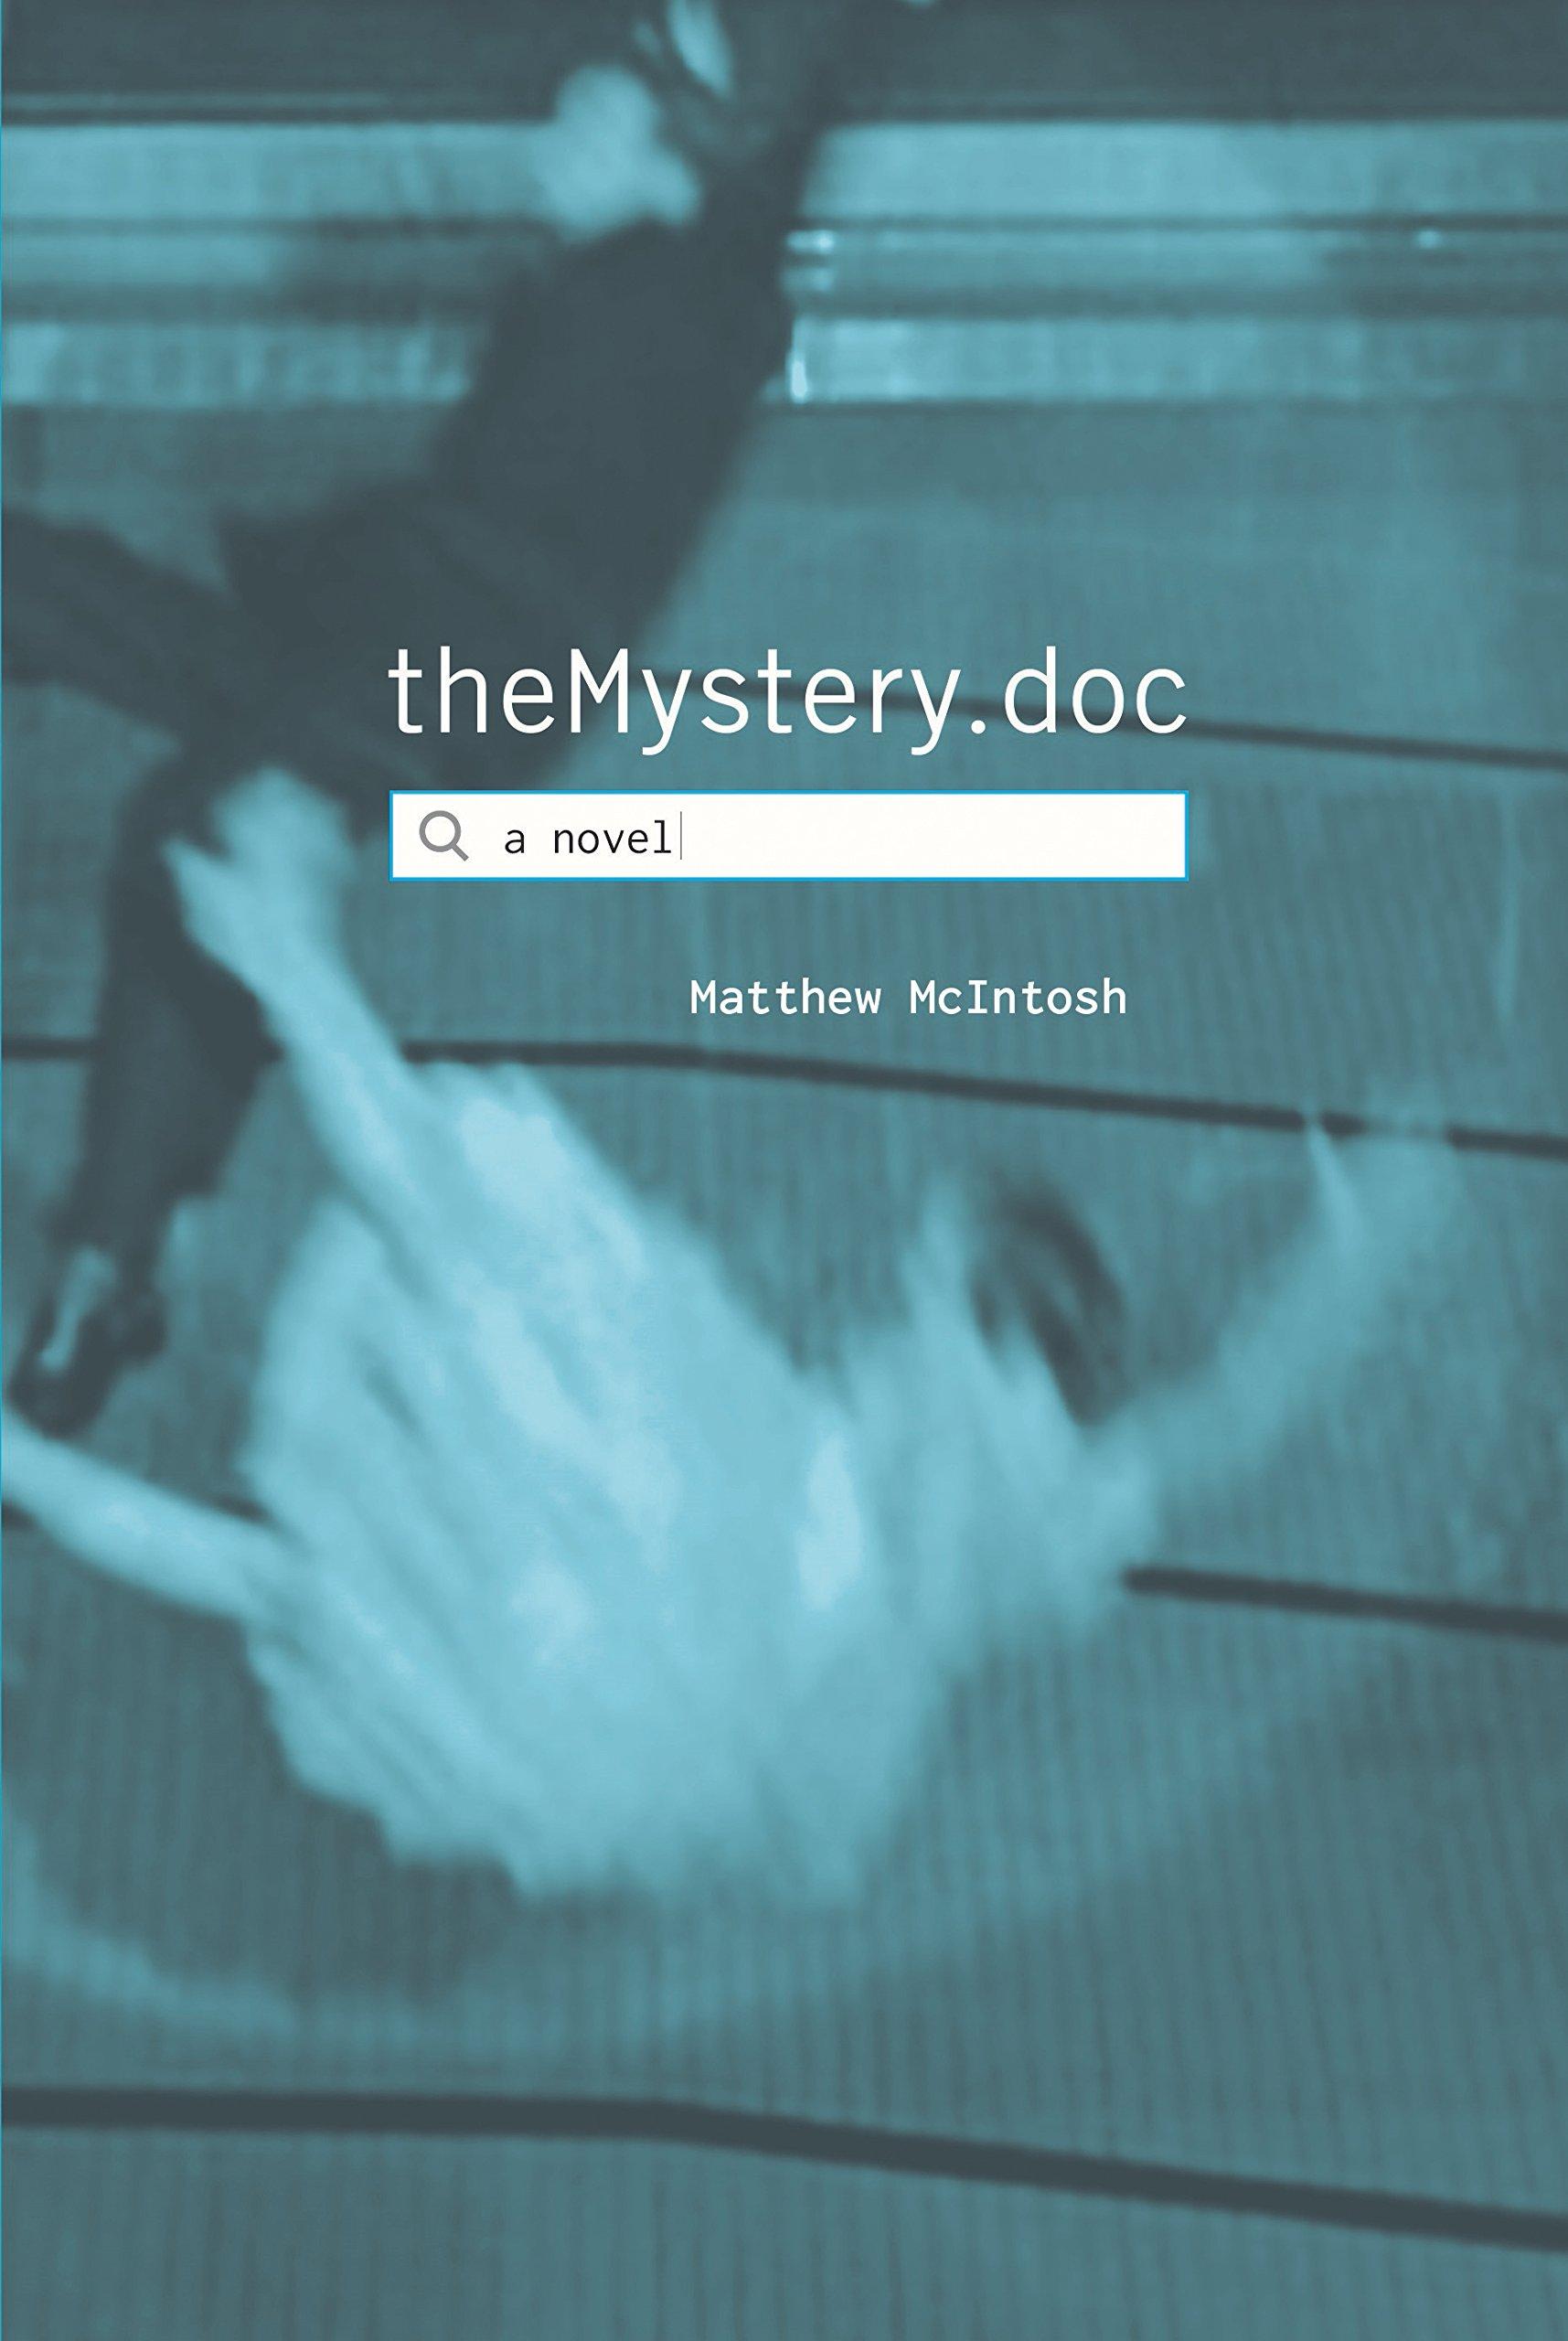 mcintosh matthew  theMystery.doc: Matthew McIntosh: 9780802124913: : Books